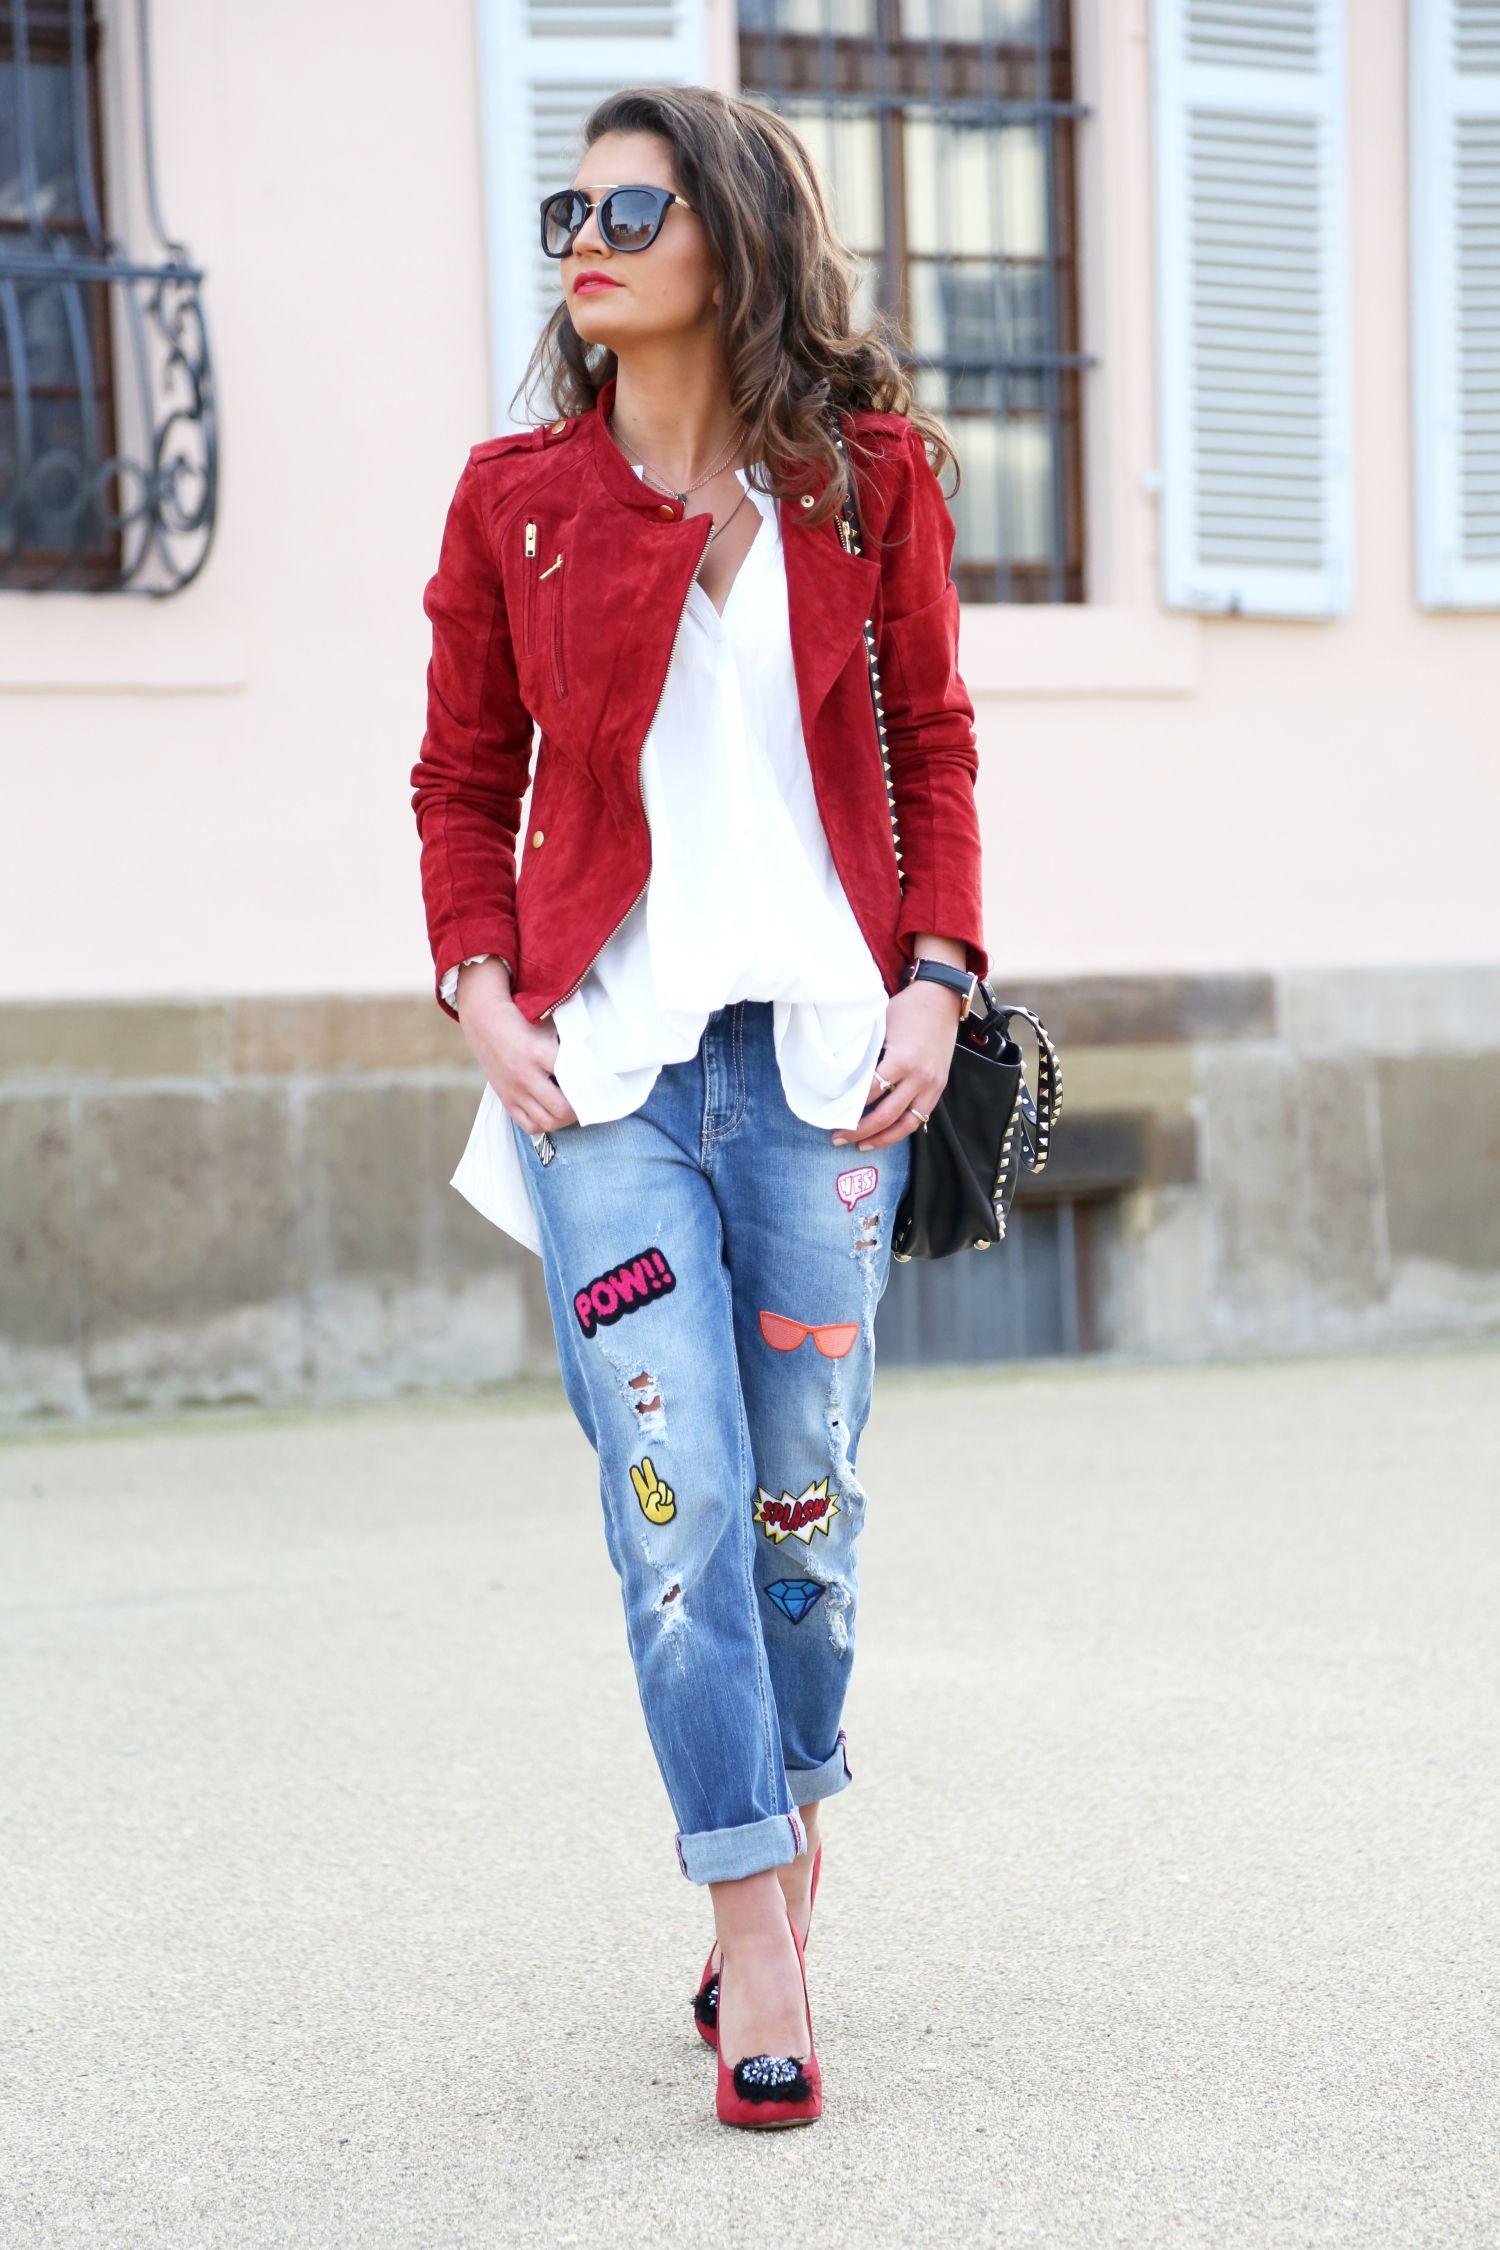 rock that sticker jeans fashionhippieloves kombination rot und jeans bluse. Black Bedroom Furniture Sets. Home Design Ideas